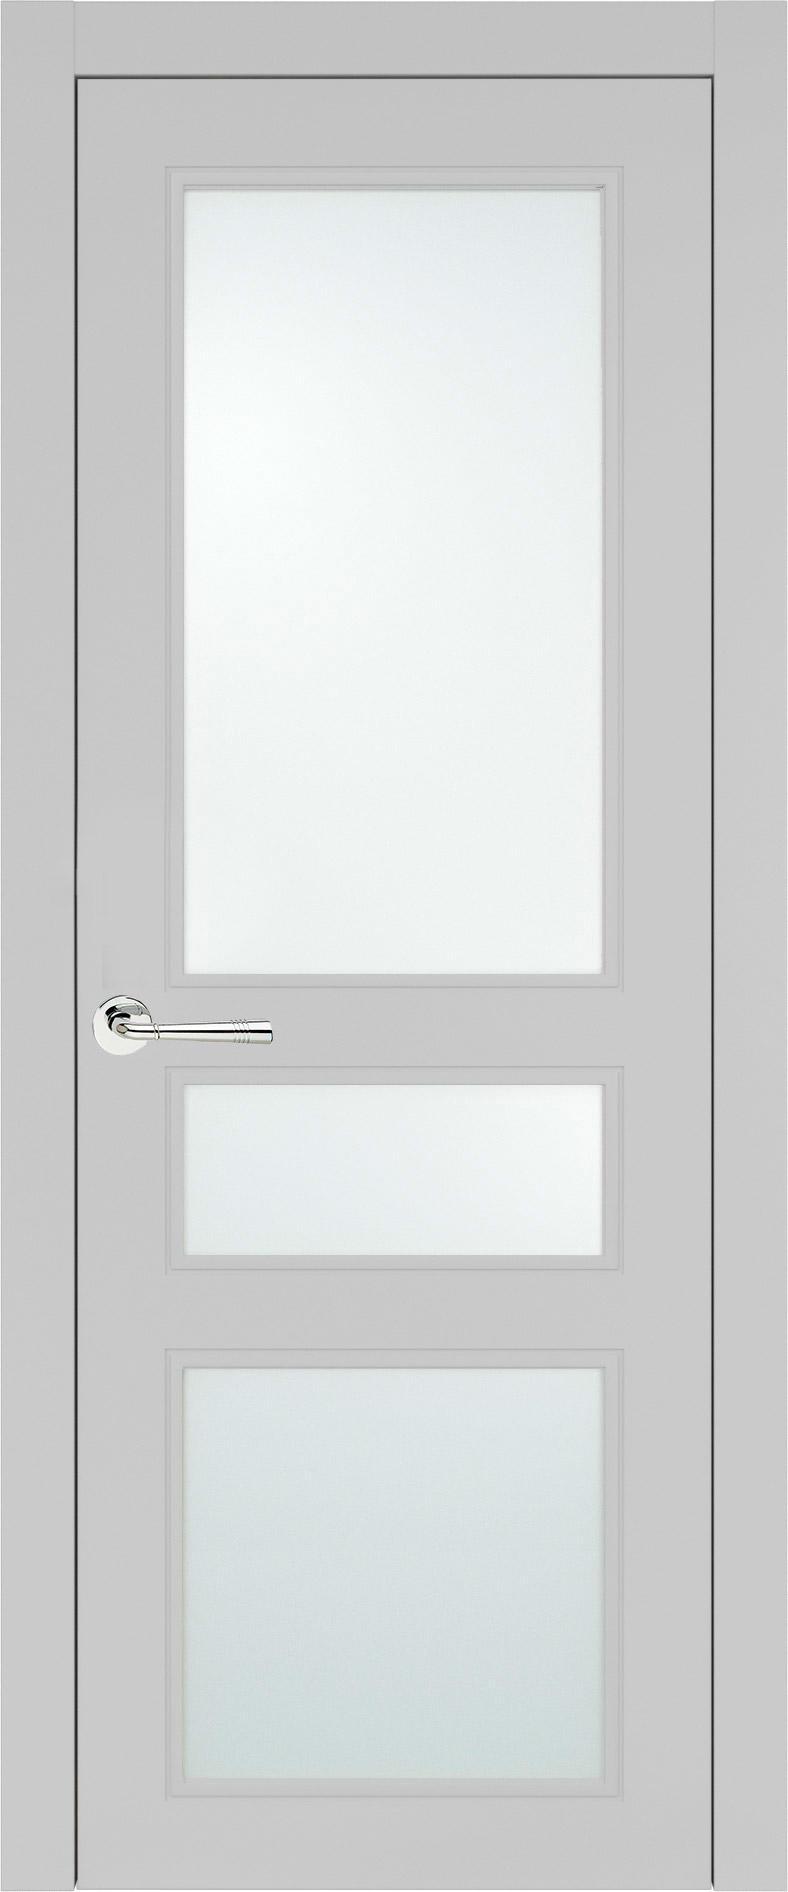 Imperia-R Neo Classic цвет - Серая эмаль (RAL 7047) Со стеклом (ДО)